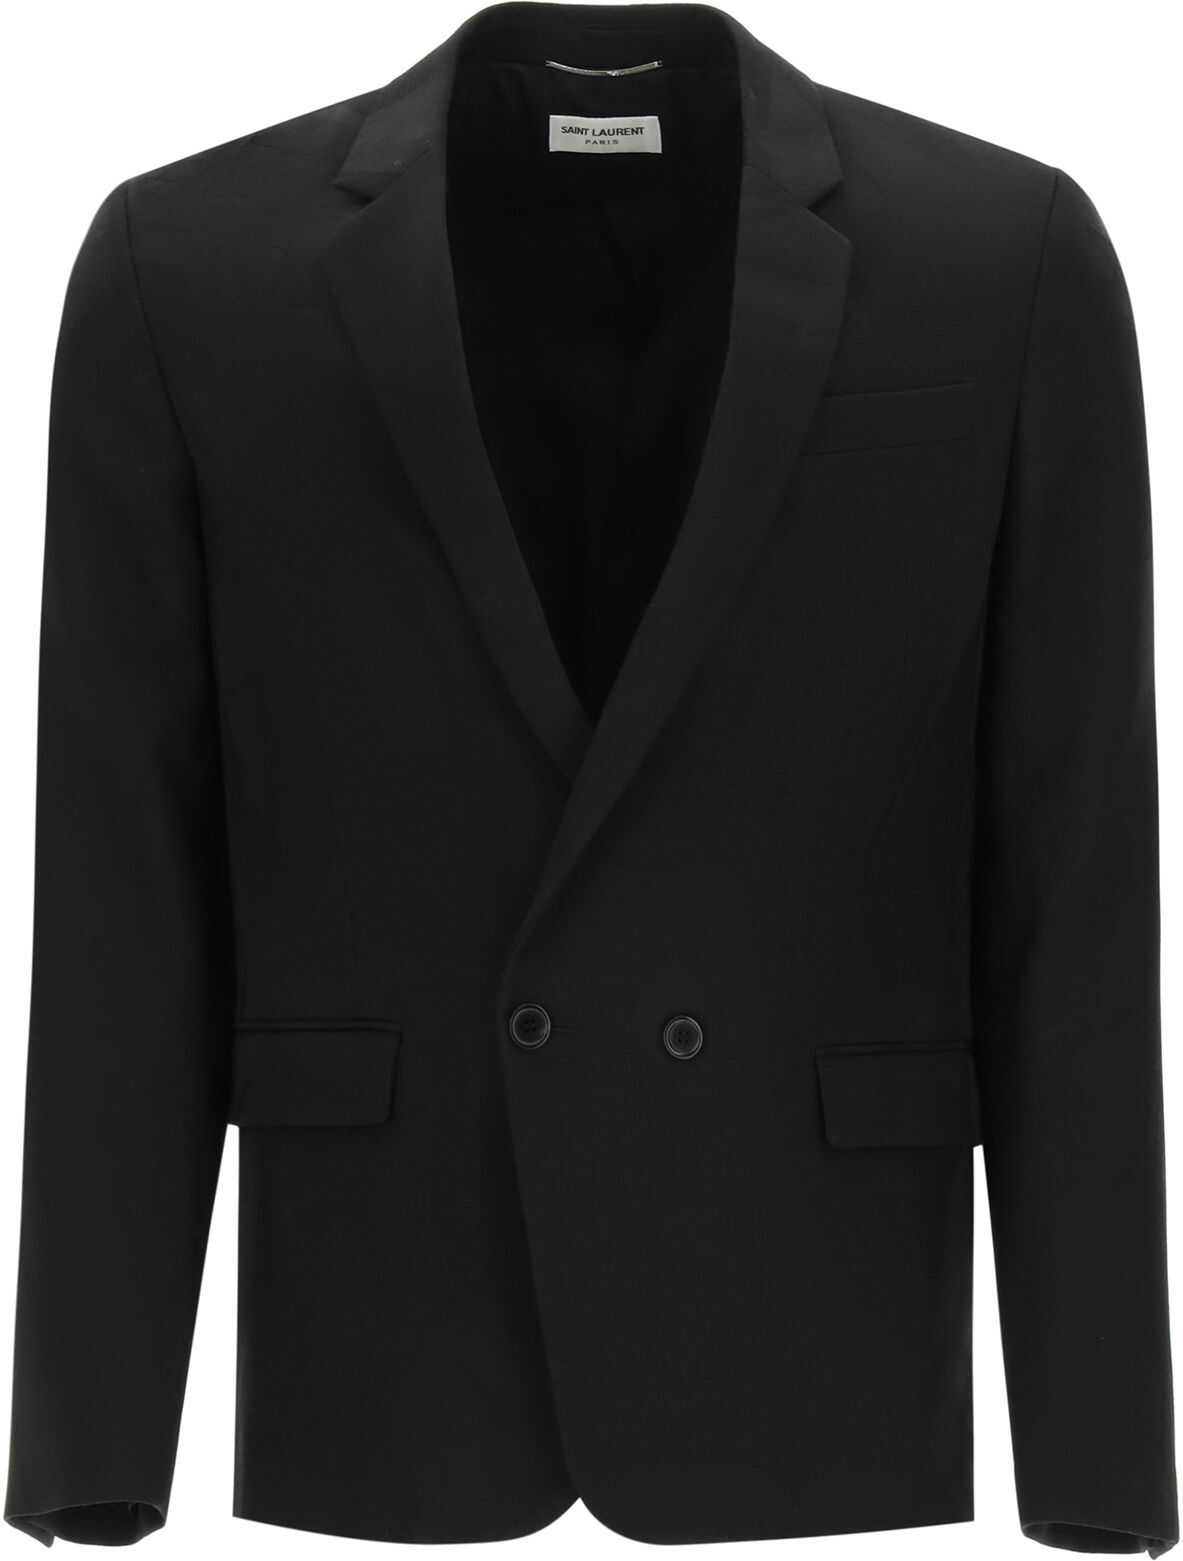 Saint Laurent Jungle Wool Jacquard Blazer BLACK imagine